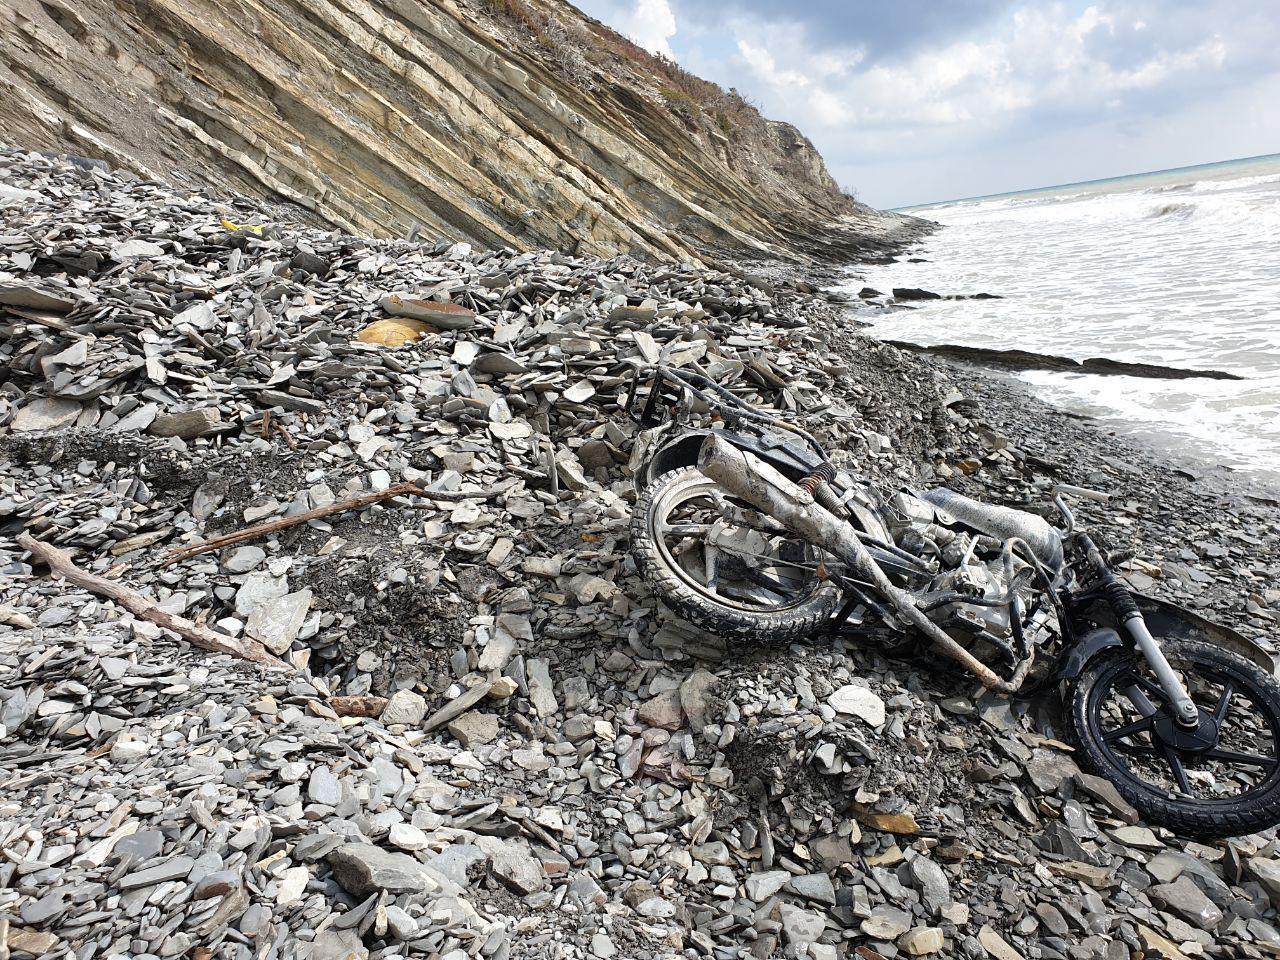 В Анапе у скал найден разбитый «байк-призрак»